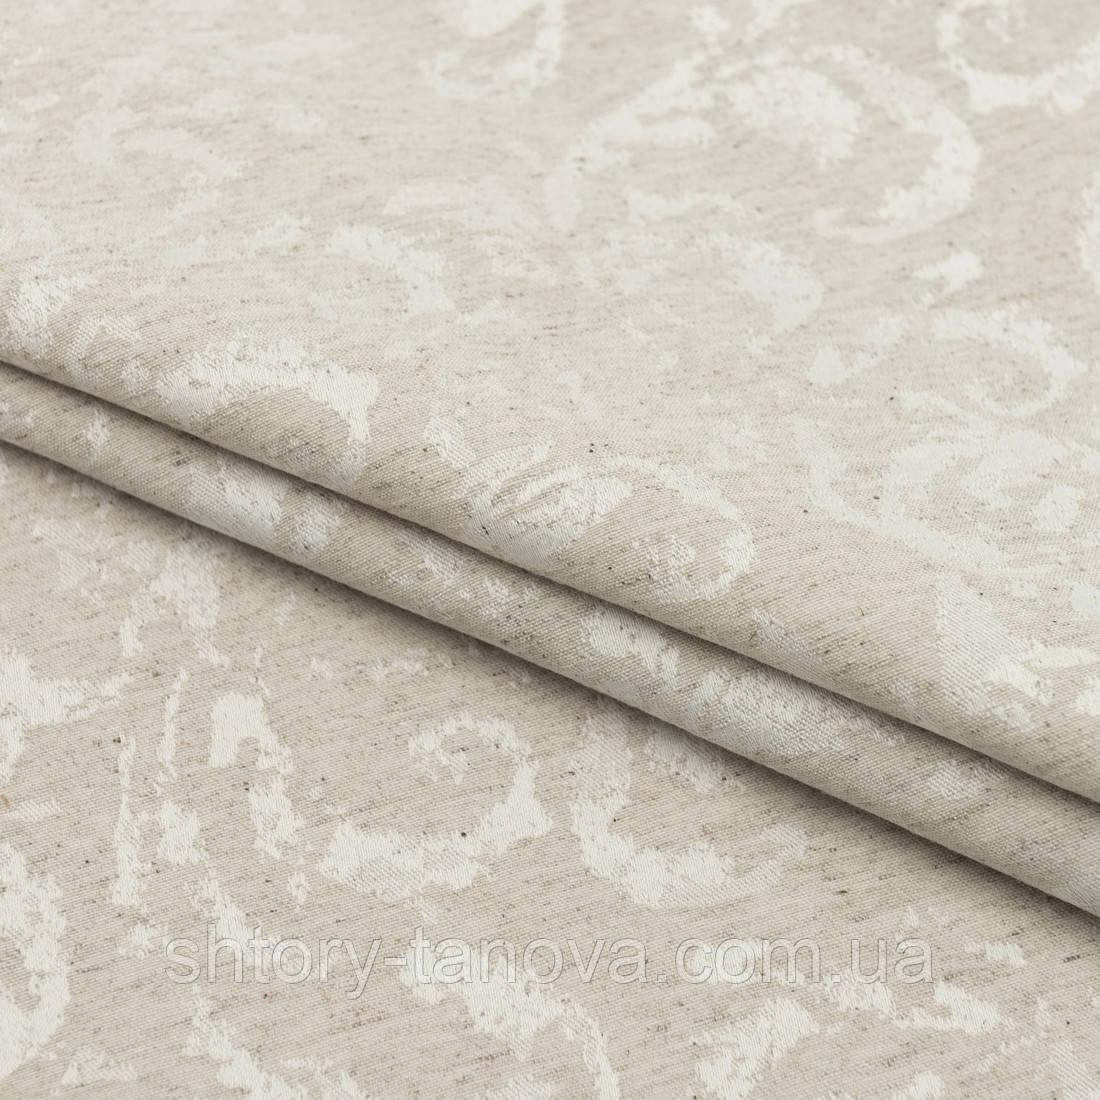 Скатертная тканина жаккард юно колір льону